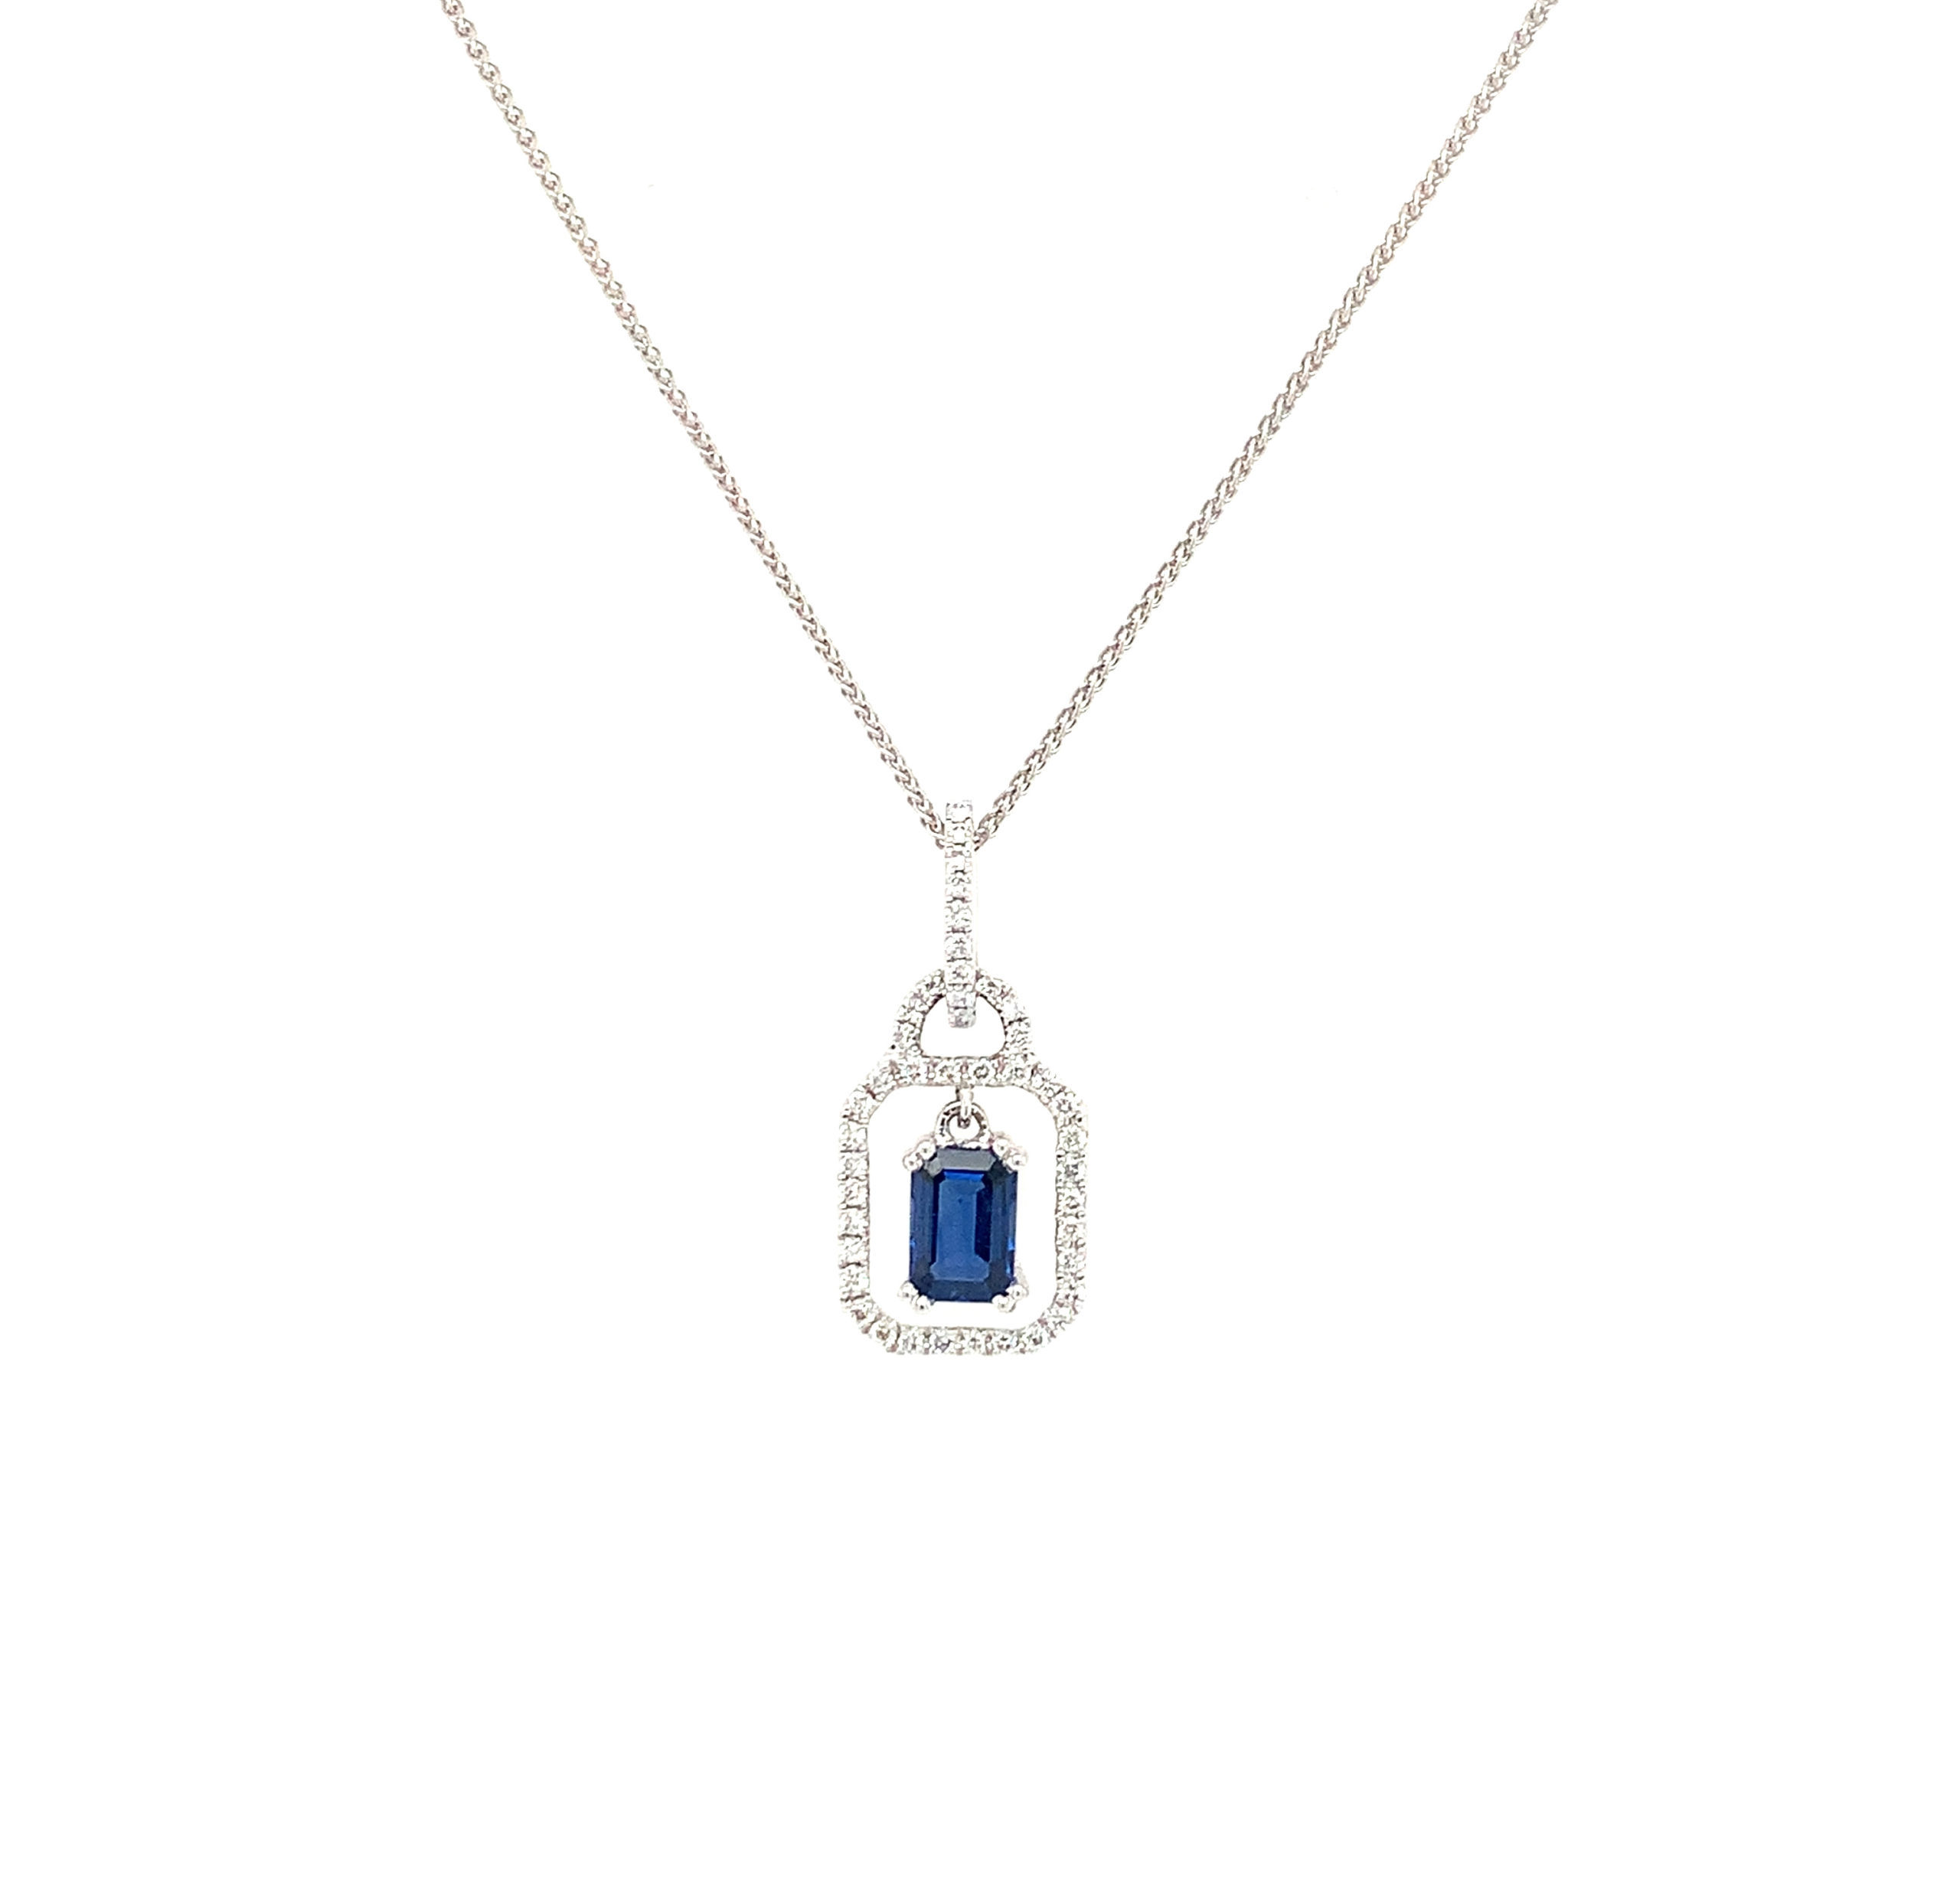 White Gold Sapphire Pendant